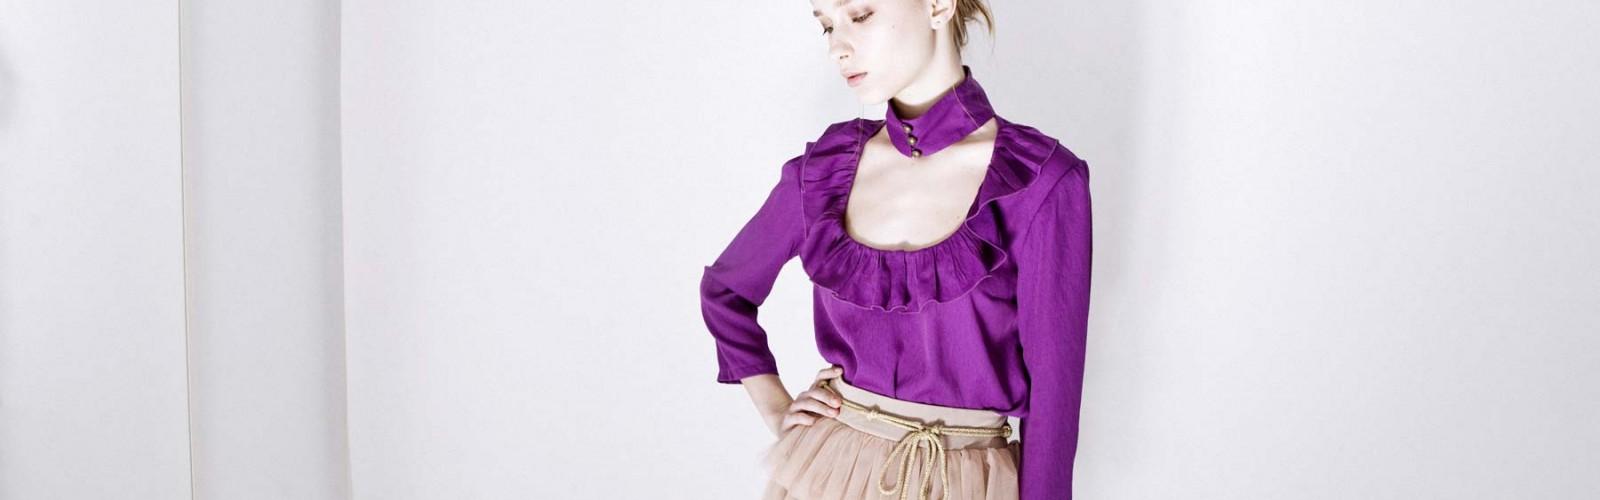 Samantha Sotos AW14-15 Collection - The Greek Foundation